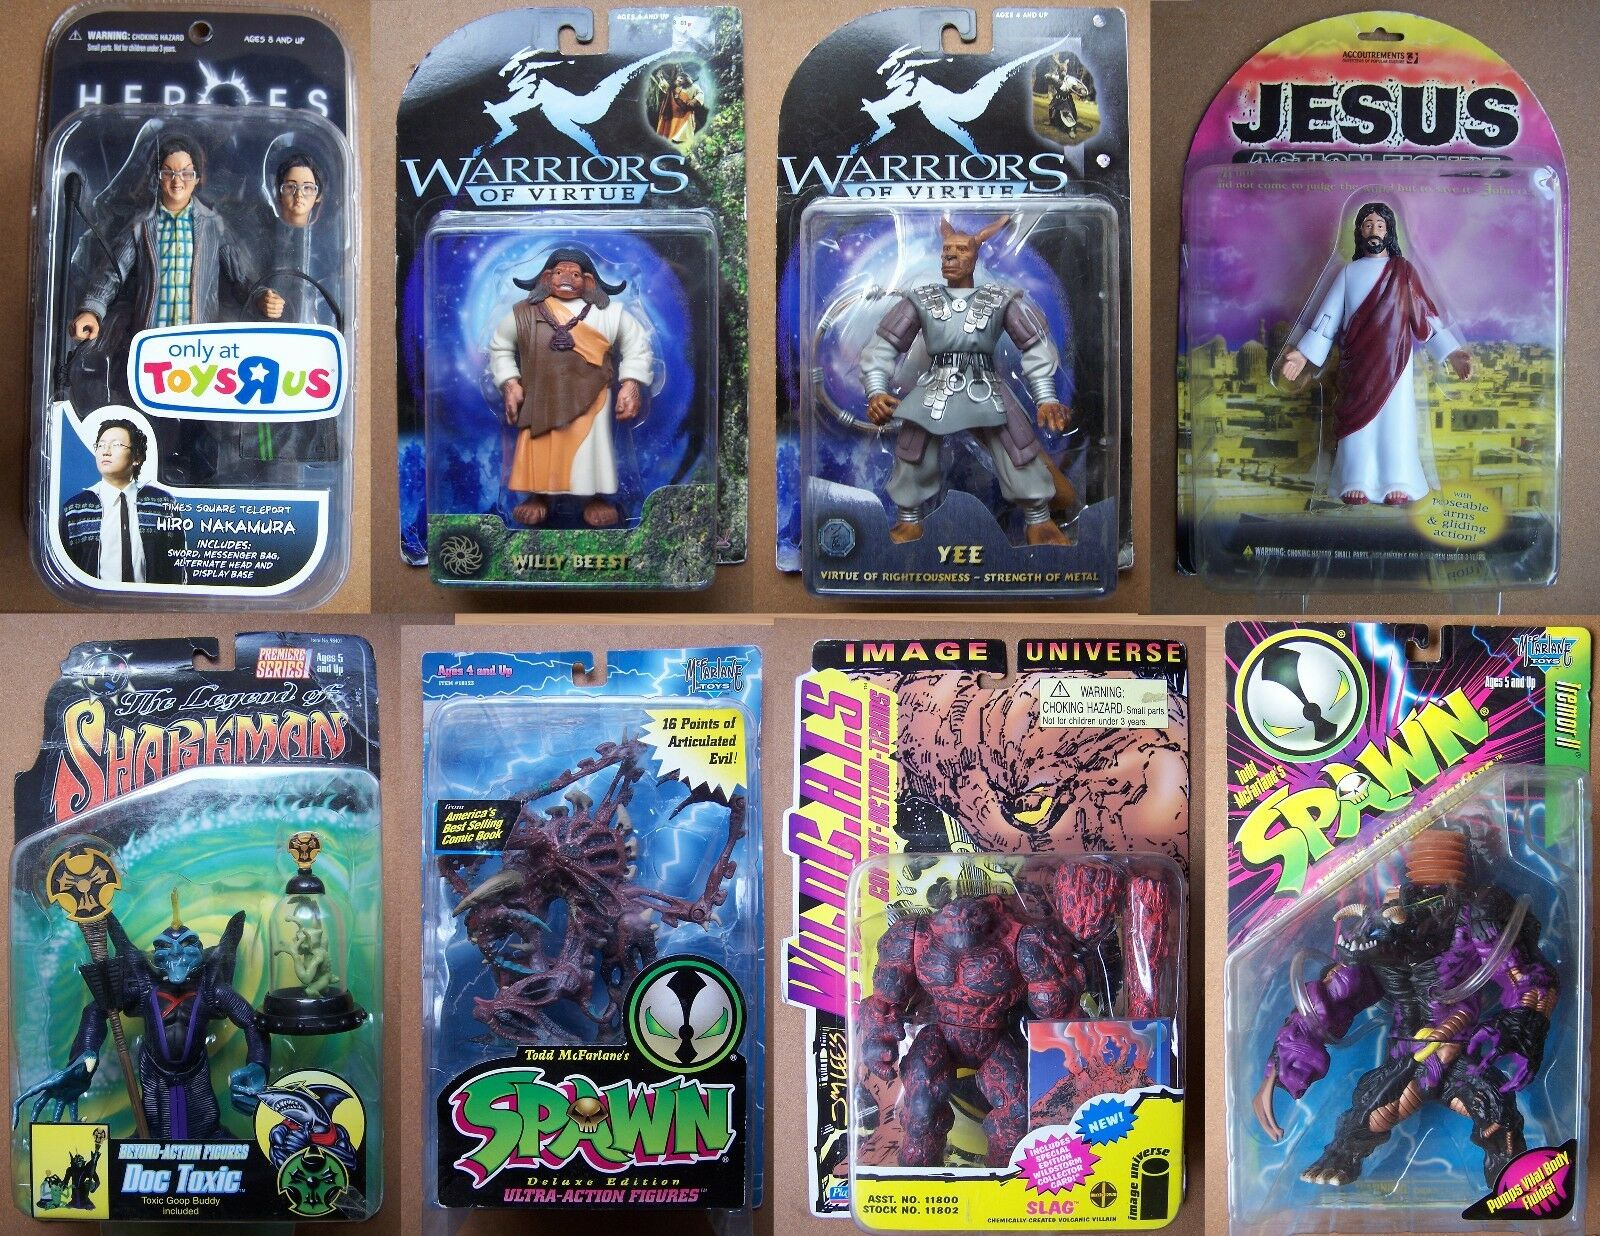 Heroes & Villains 8 Raro Difícil de encontrar Jesús Spawn púrpurator guerreros de la virtud héroes escoria de TV